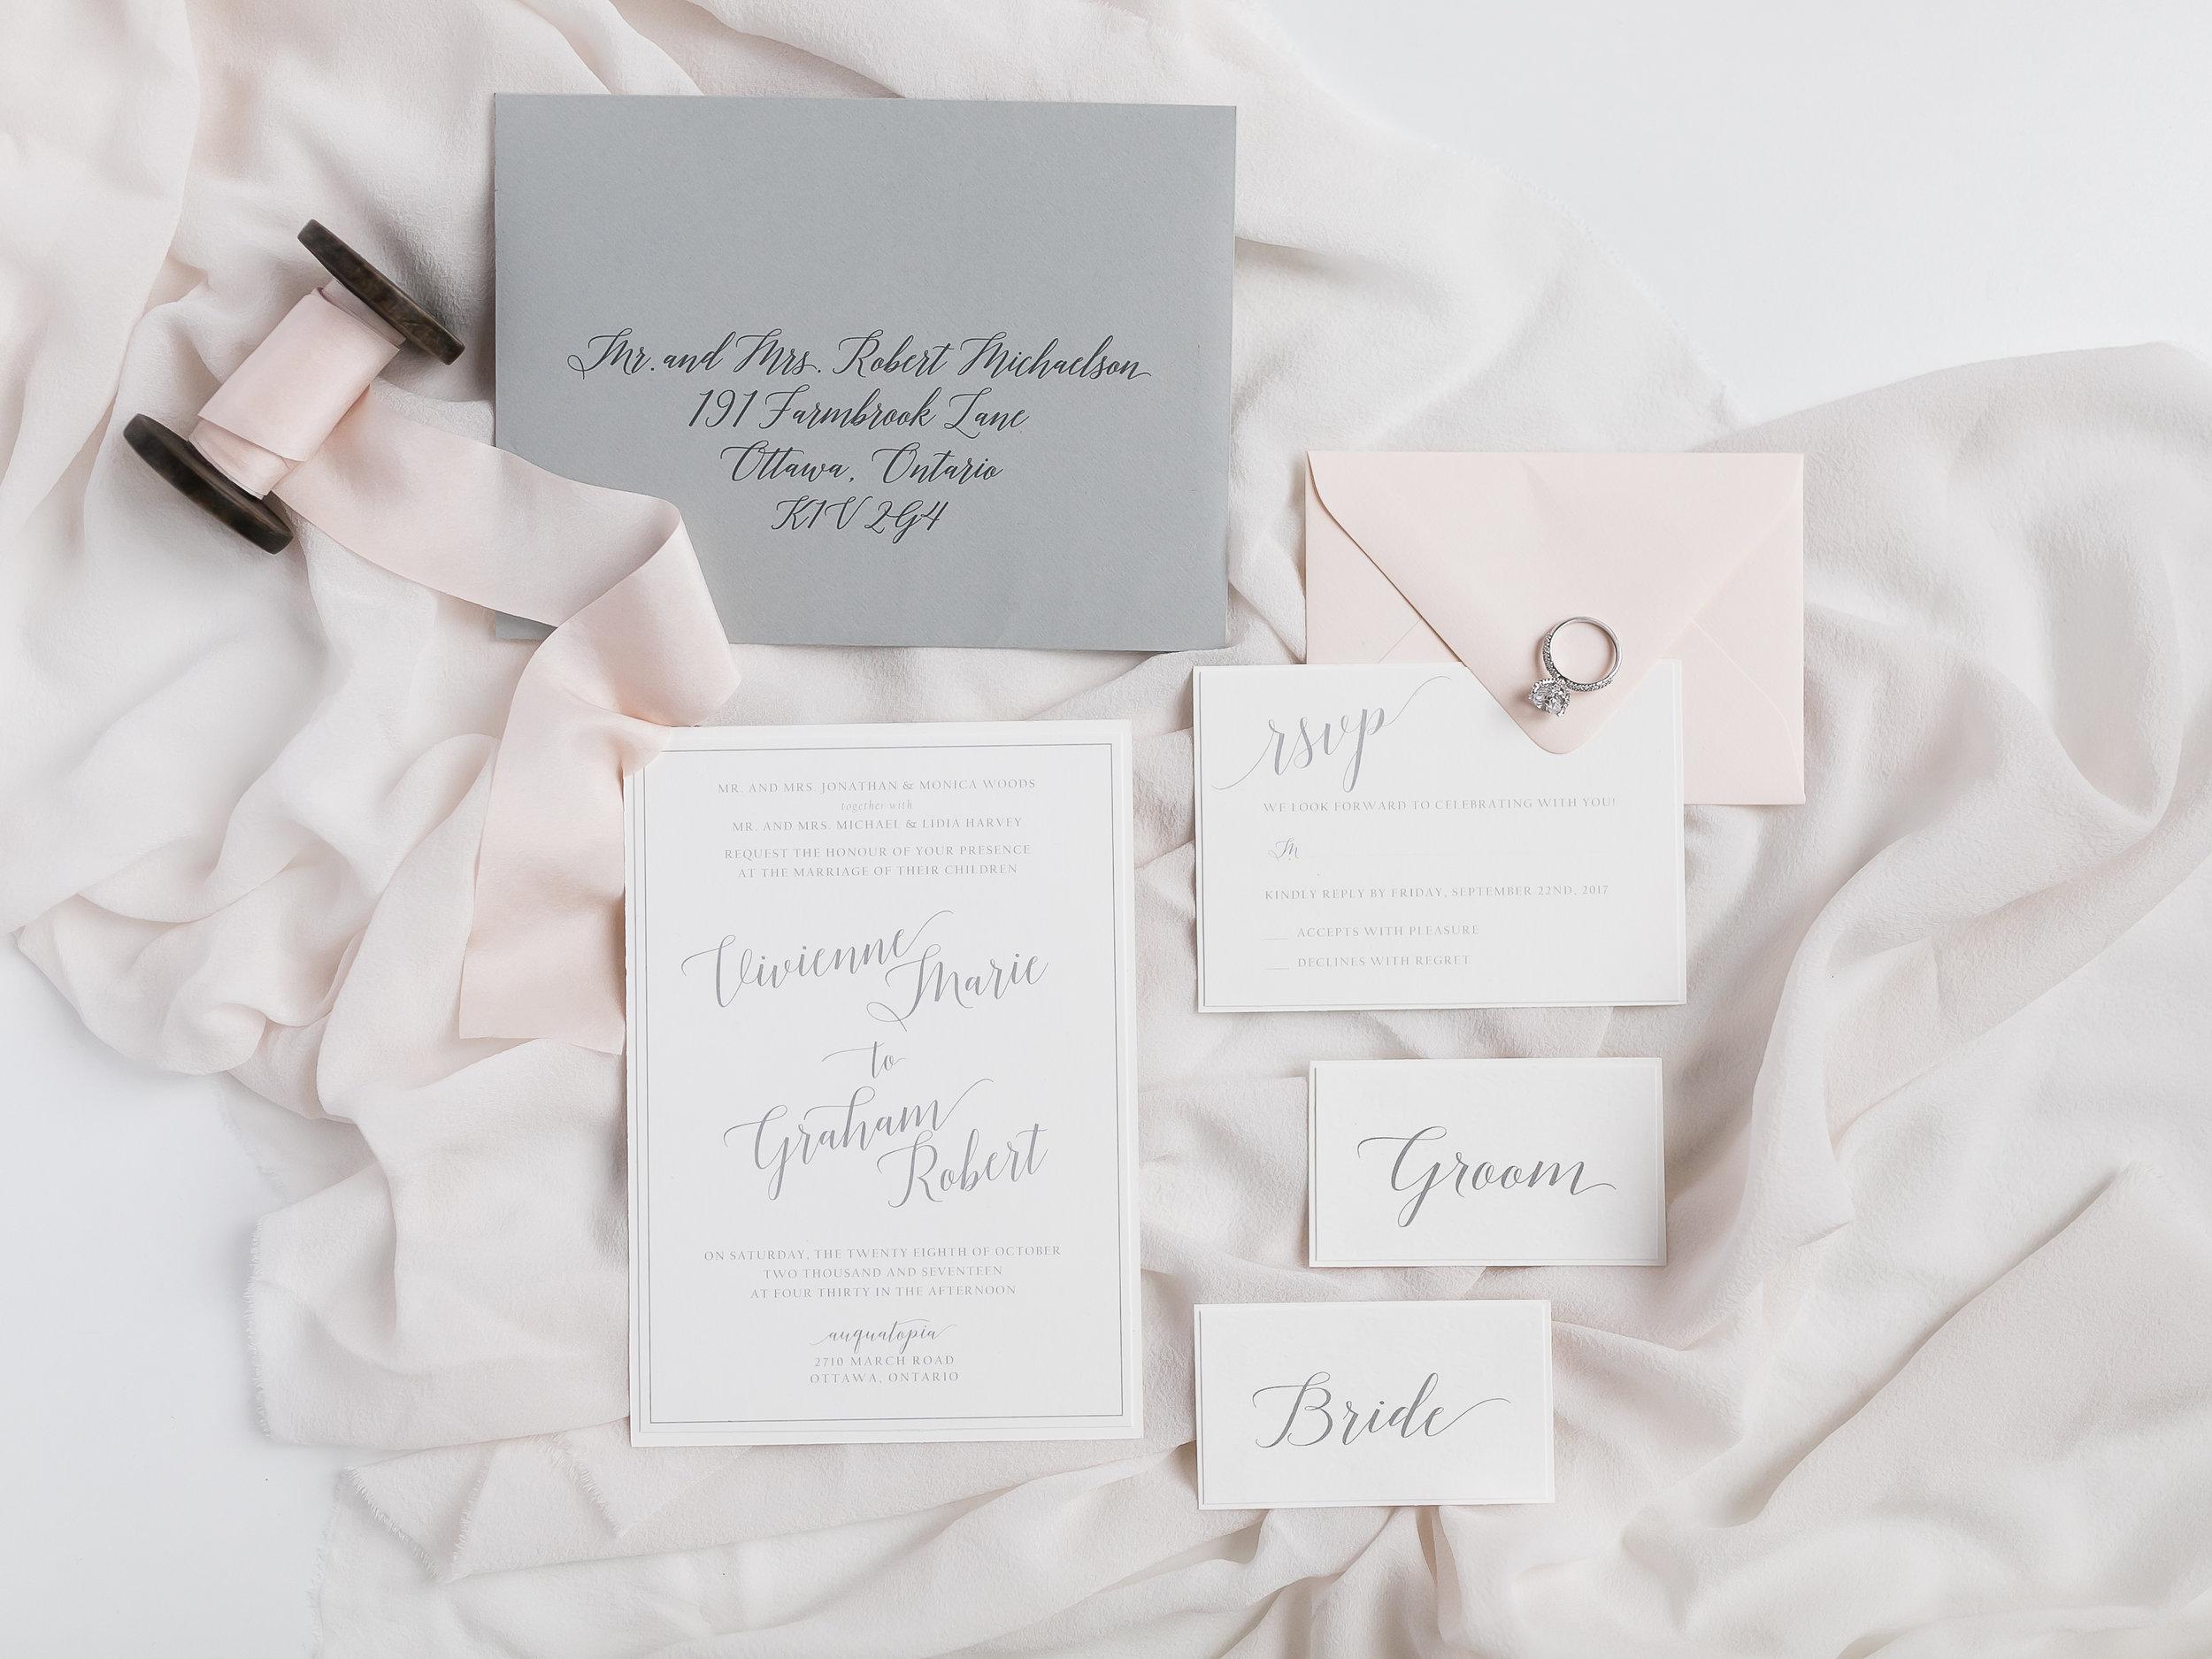 Aquatopia-Wedding-Ottawa-Wedding-Photographer-Stephanie-Mason-Photography-108.jpg